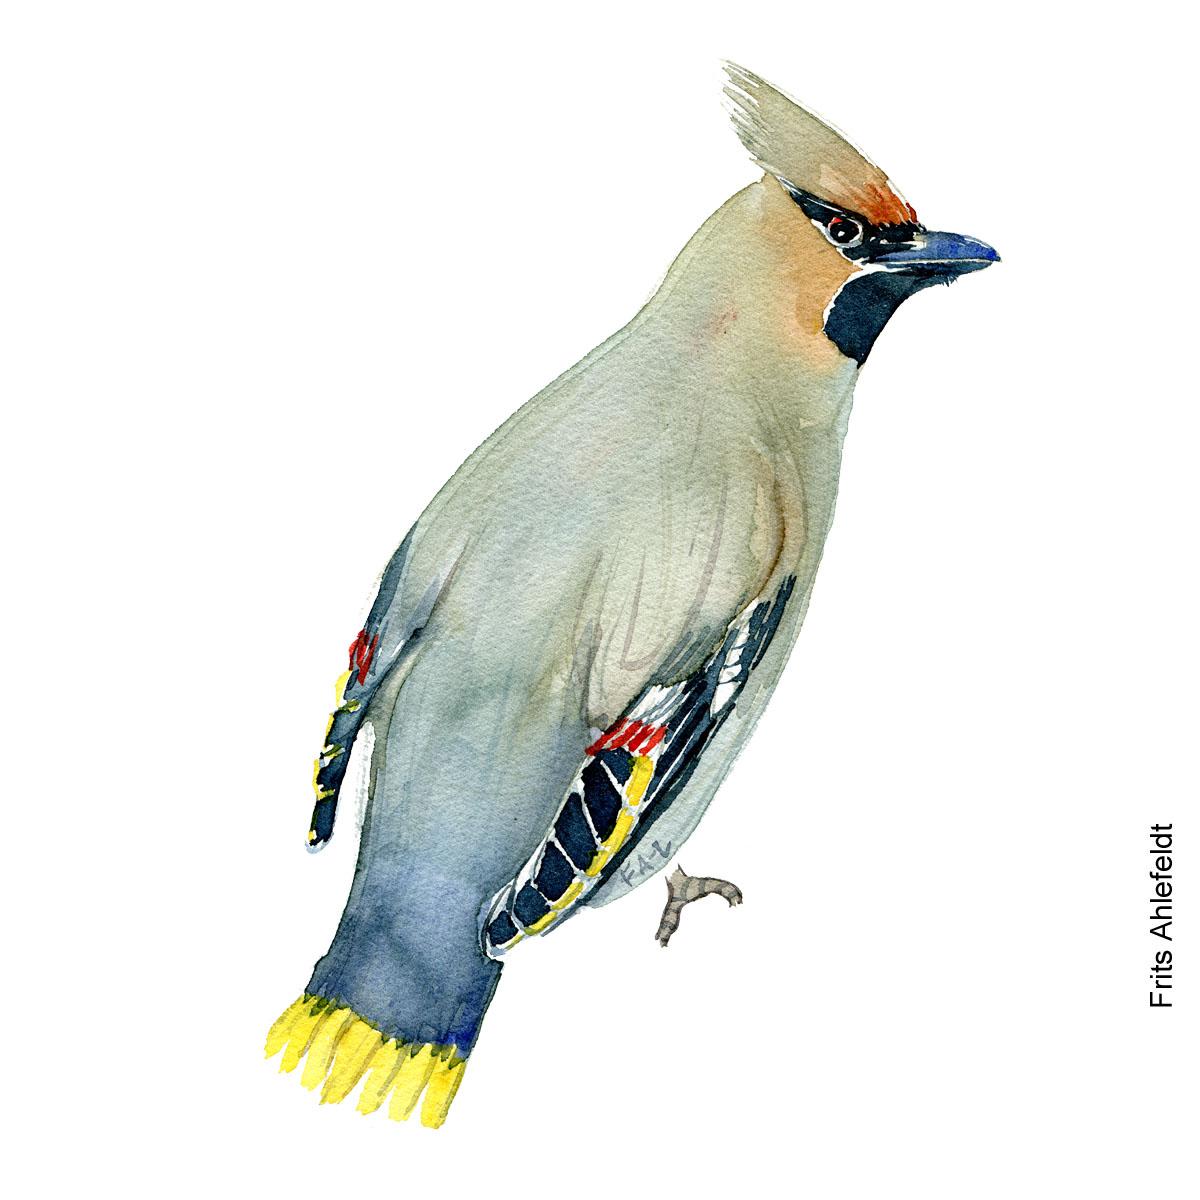 Silkehale - Bohemian waxwing bird watercolor painting. Artwork by Frits Ahlefeldt. Fugle akvarel